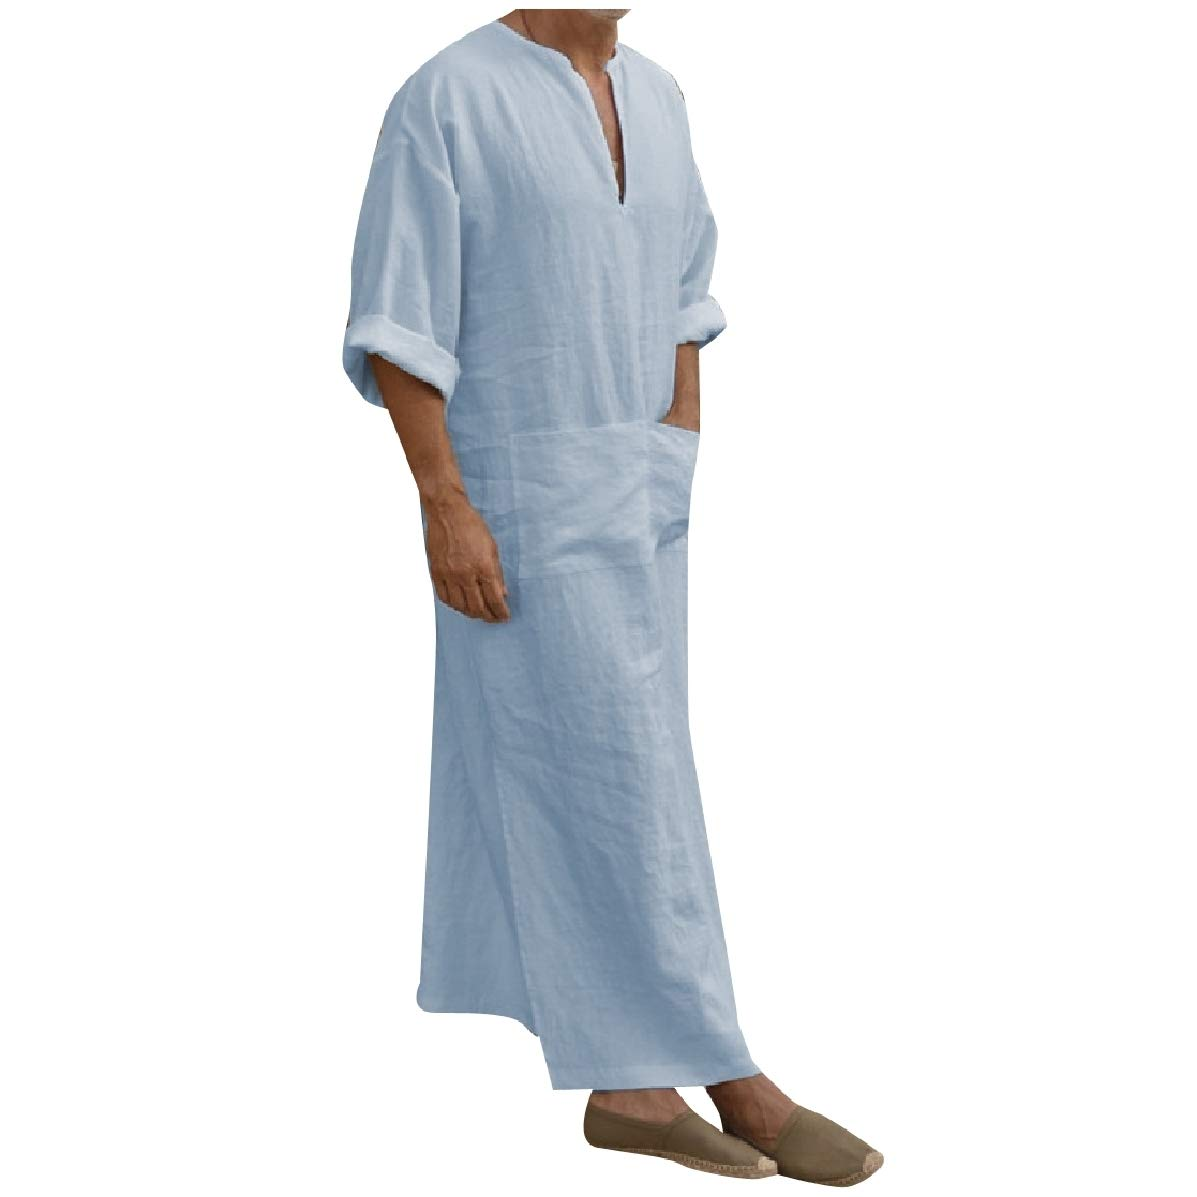 YUNY Men Middle East Kaftan Gown Cotton Shirt Muslim Islamic Kaftan Blue M